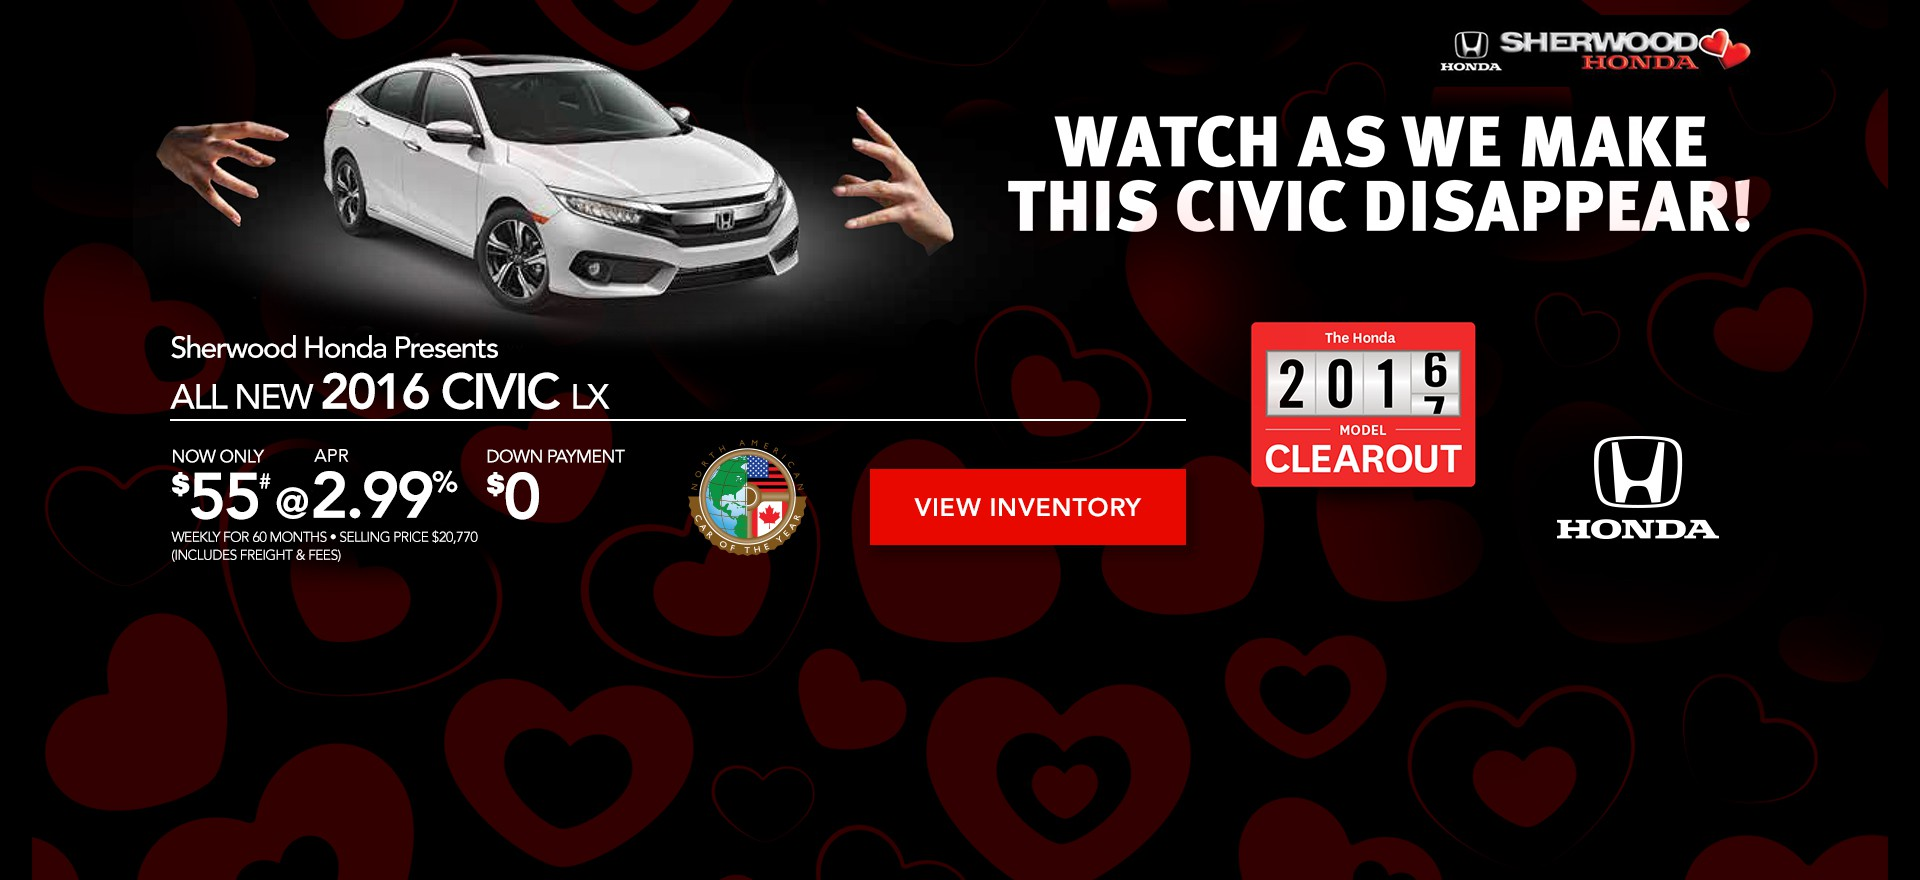 2016 Civic LX on Finance